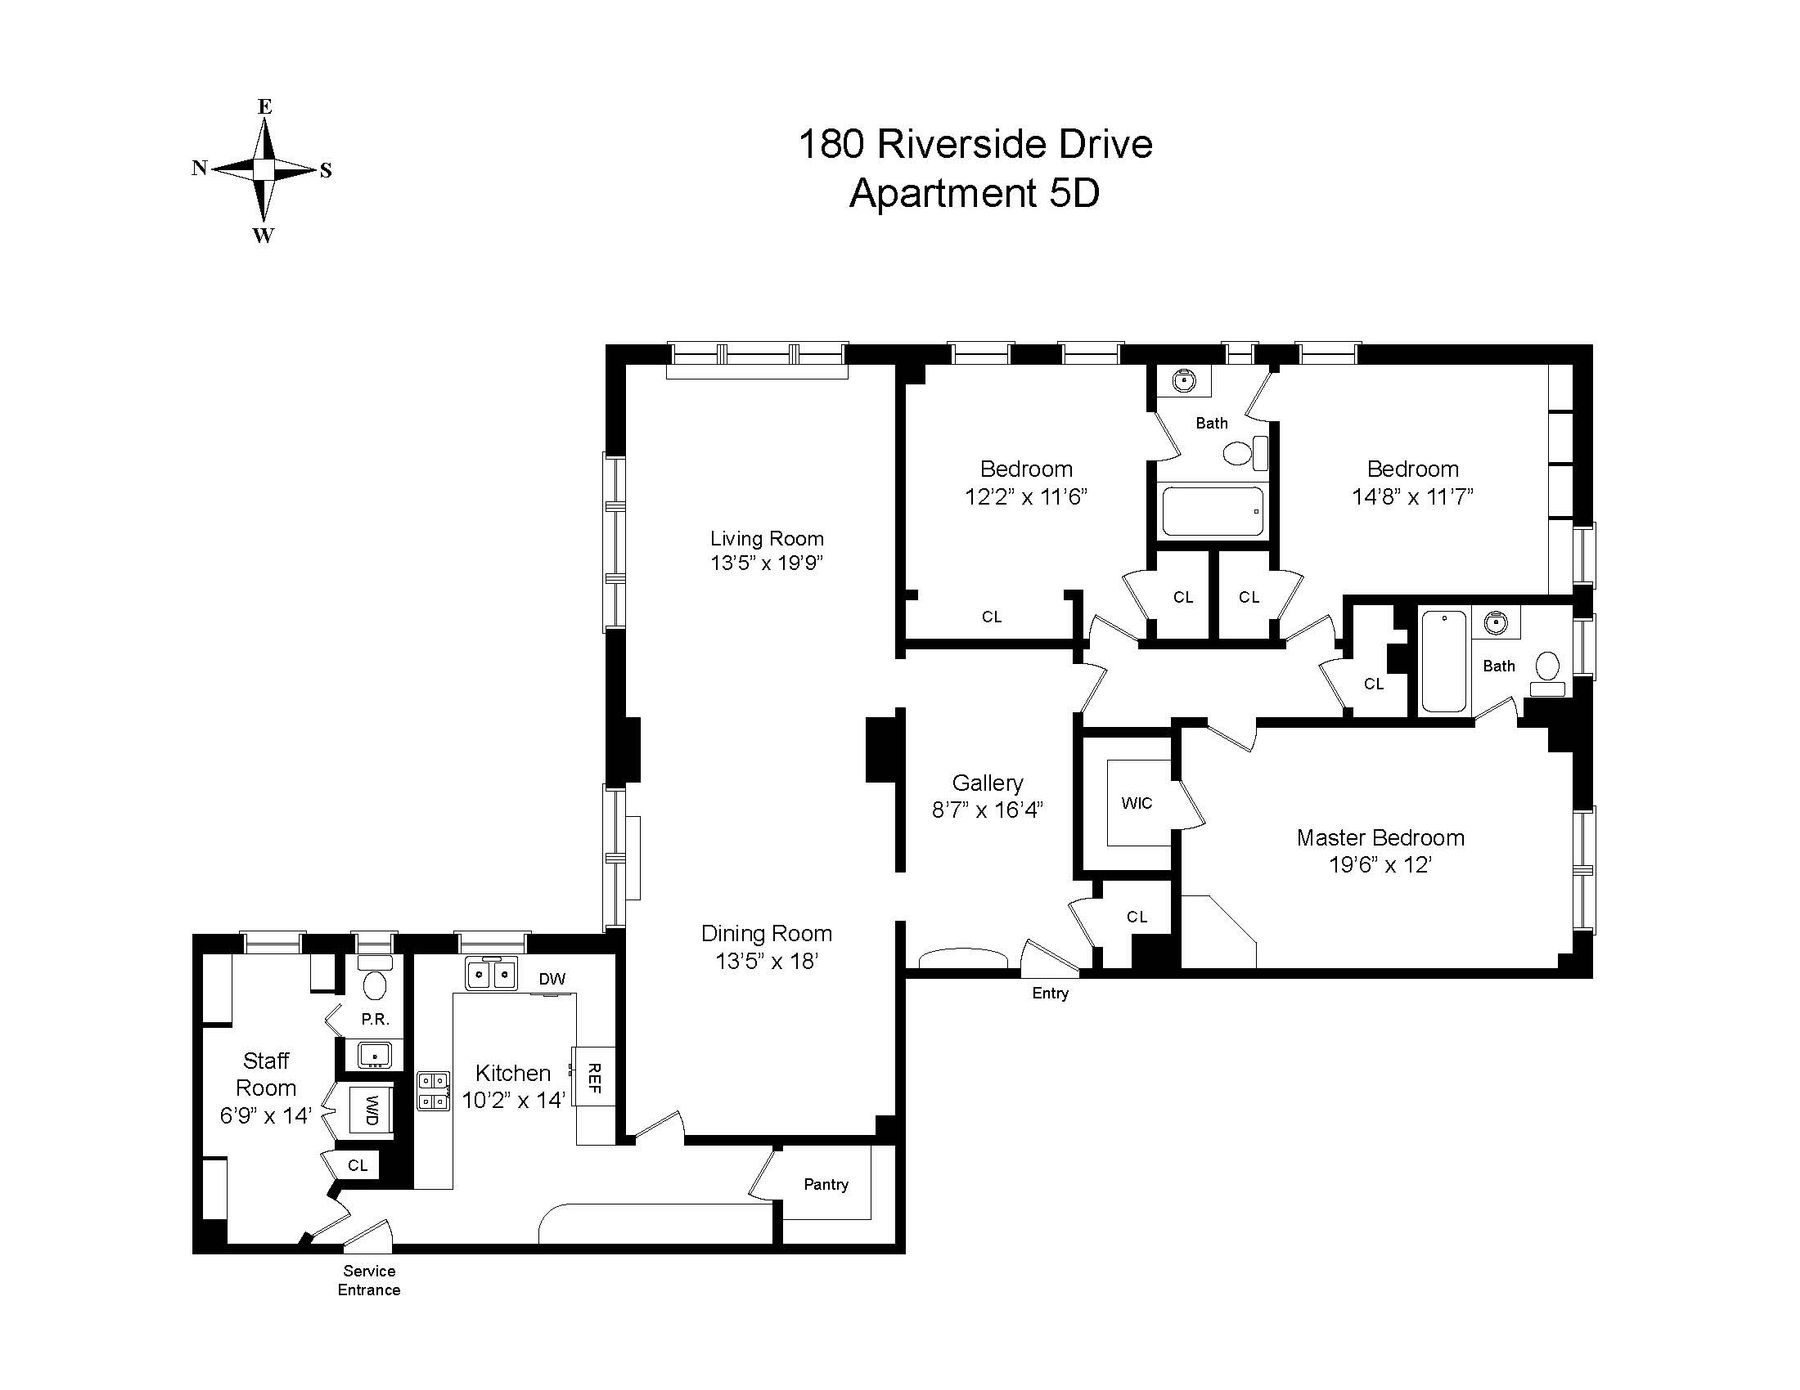 Co-op Properties для того Продажа на 180 Riverside Drive,5D 180 Riverside Drive 5D, New York, Нью-Йорк 10024 Соединенные Штаты